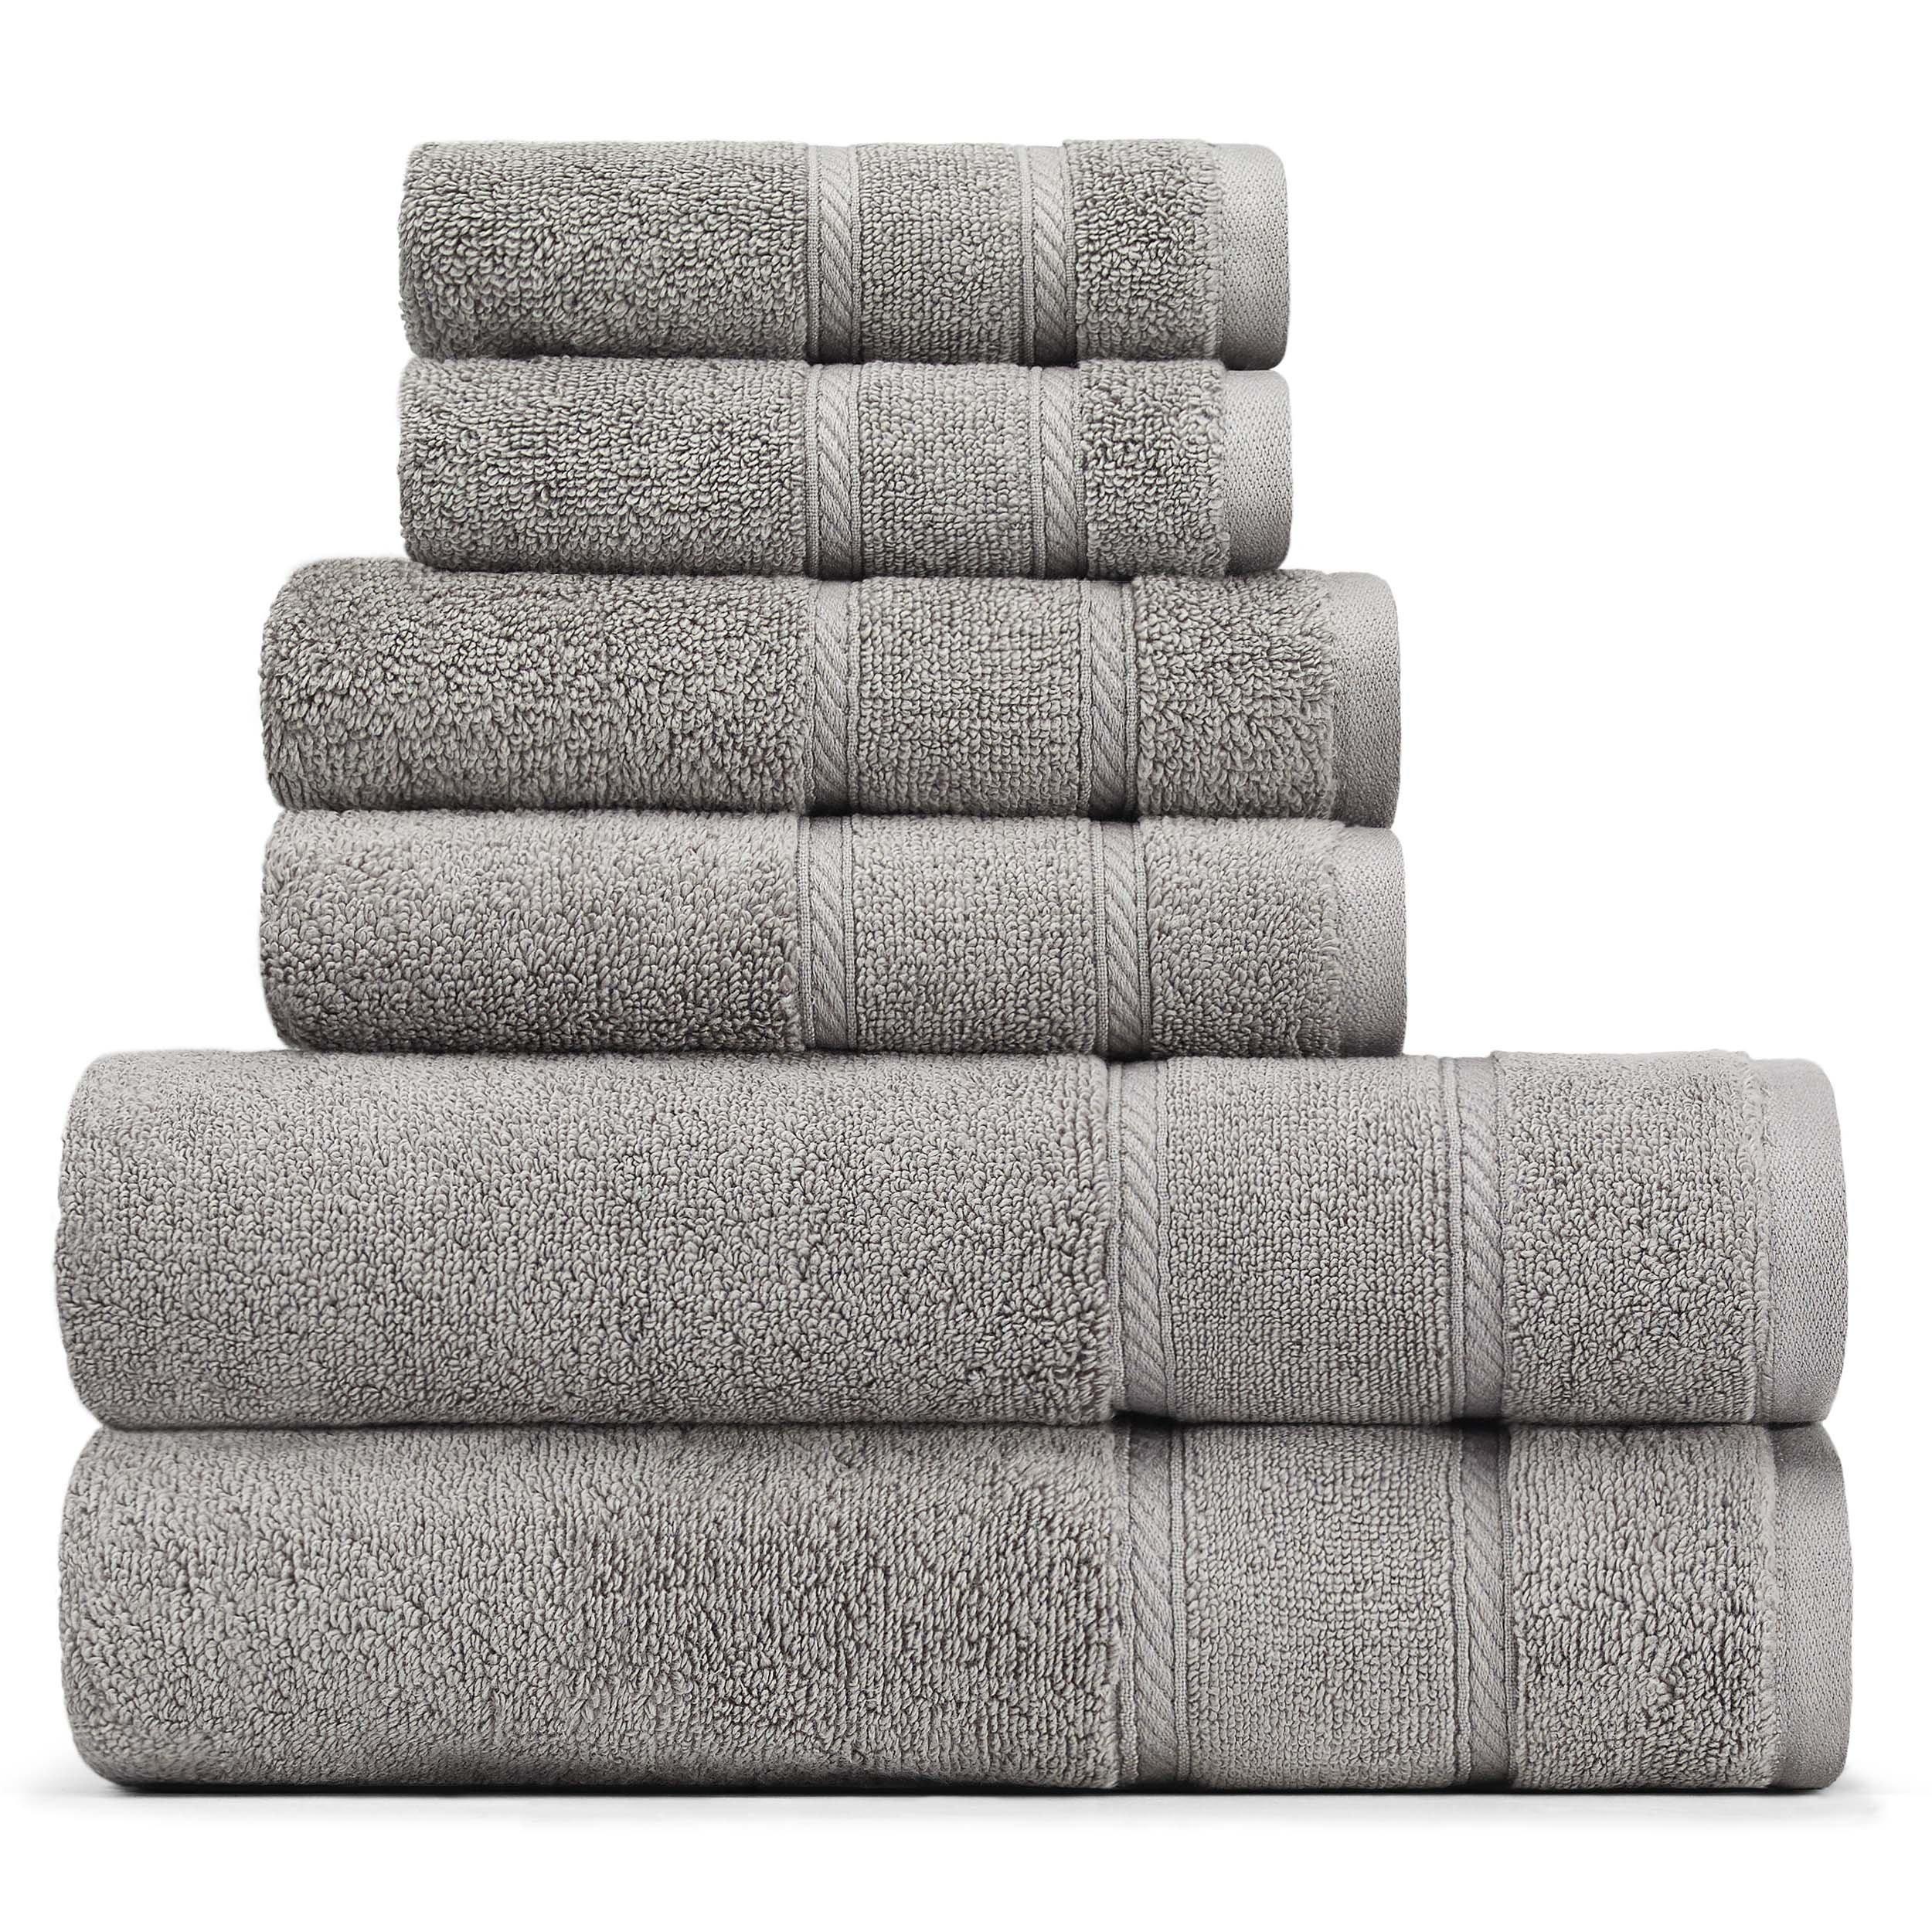 Nautica Belle Haven 6-Piece Towel Set, 6Piece, Grey